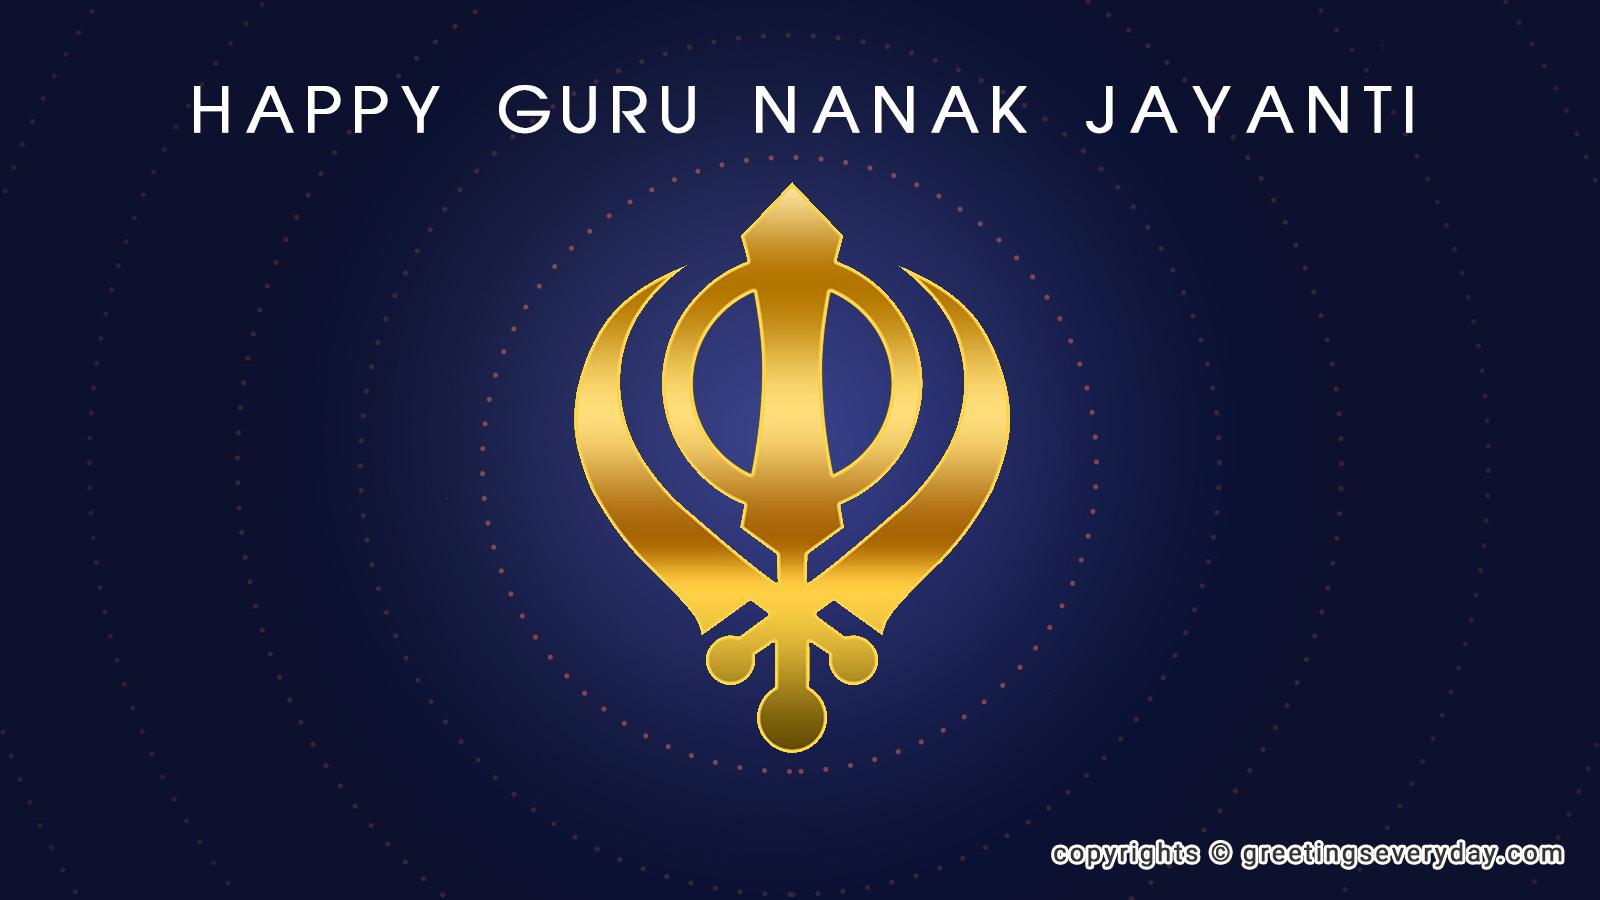 Guru Nanak Jayanti Facebook Cover Photo, Banners & WhatsApp Dp